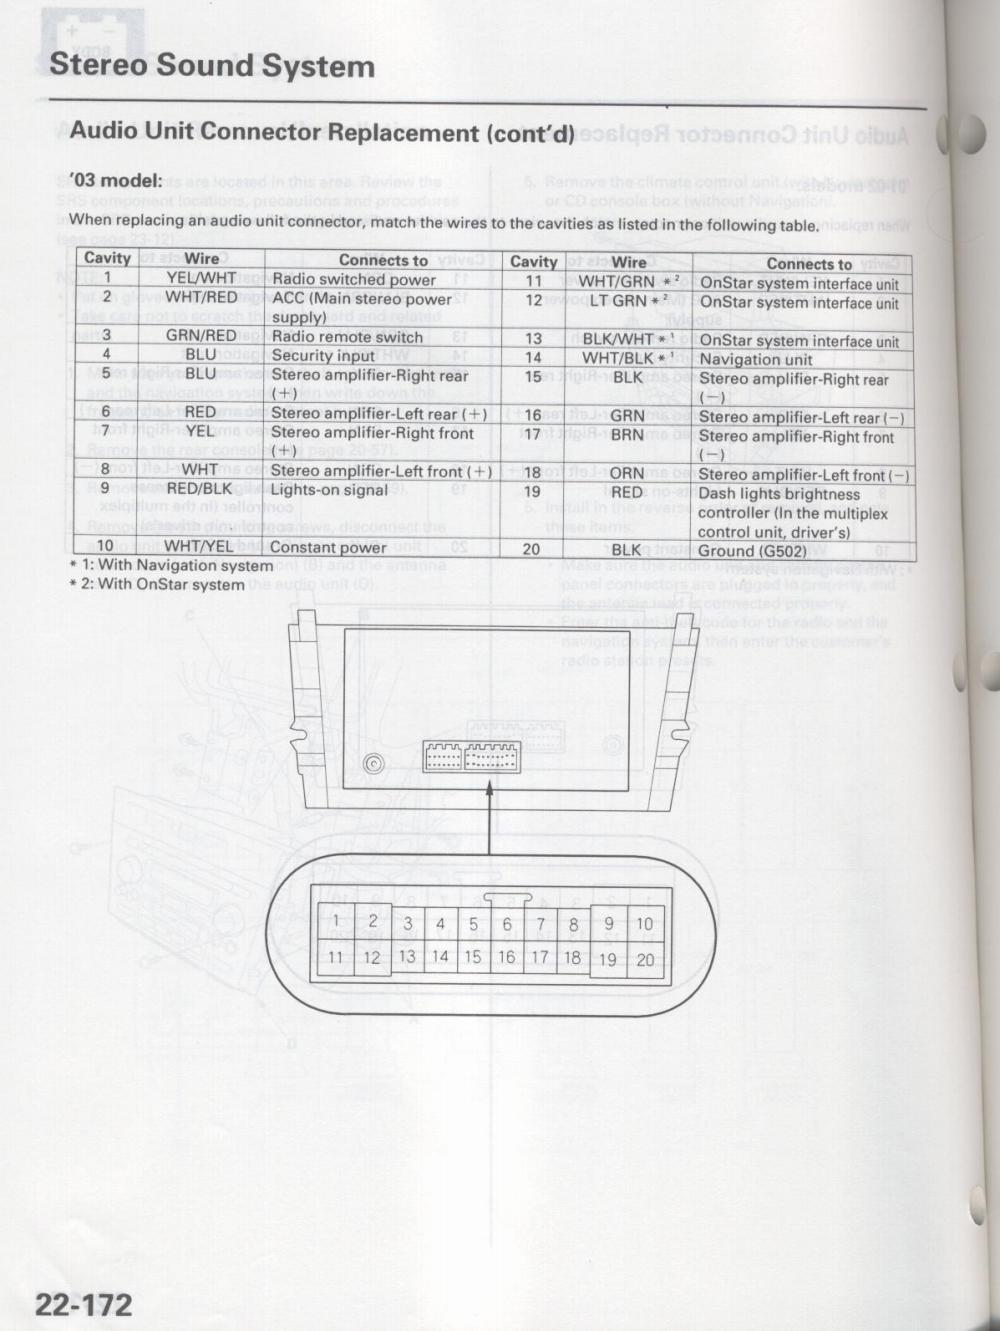 hd_1060] accord radio wiring diagram together with 2000 acura tl wiring  diagram  tobiq bupi bletu ndine remca trofu funi sarc exxlu umng mohammedshrine  librar wiring 101